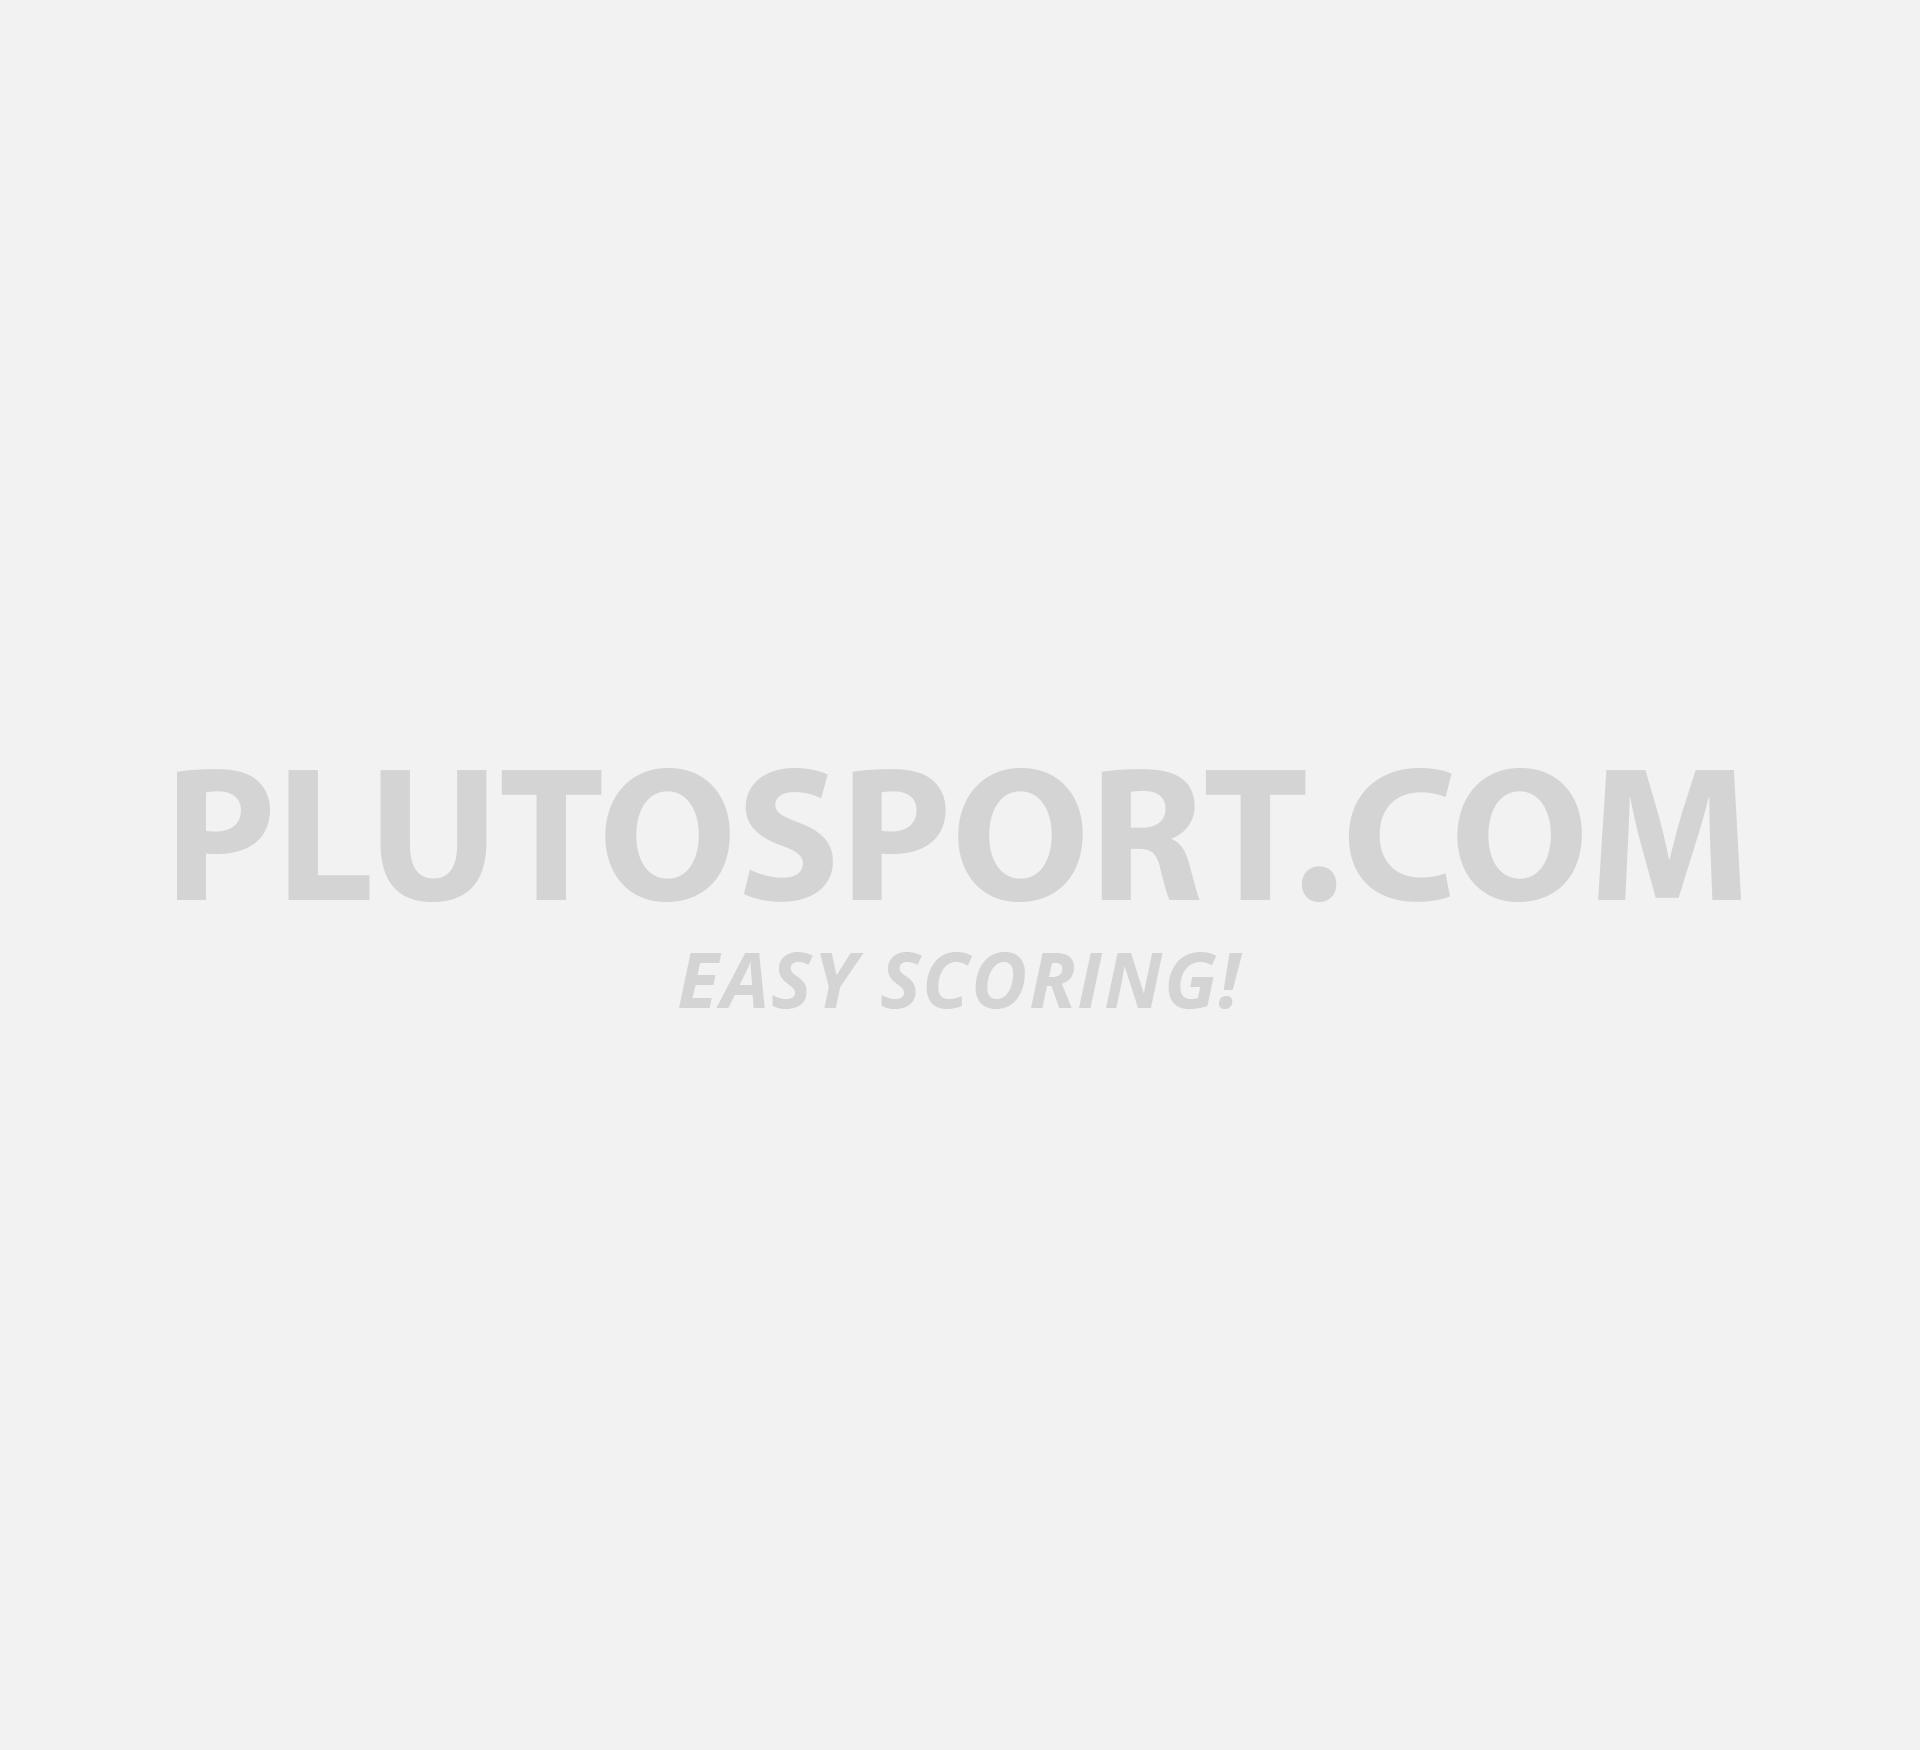 Asics Asics Sports Gel 19973 Blackheath 6 Chaussures Hockey Sports | 17d9745 - artisbugil.website